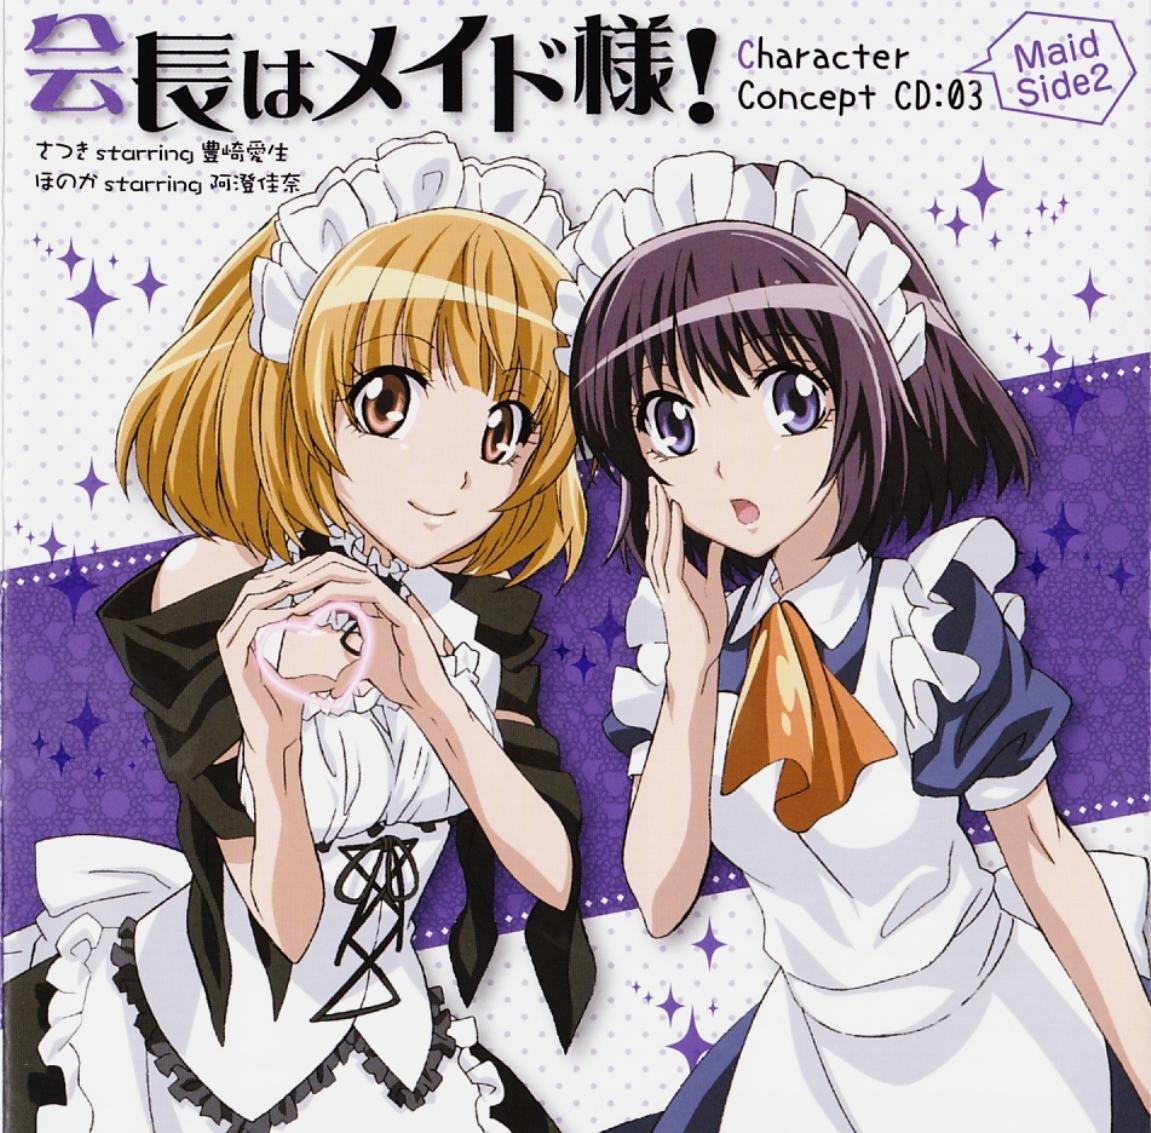 bondage Anime maid